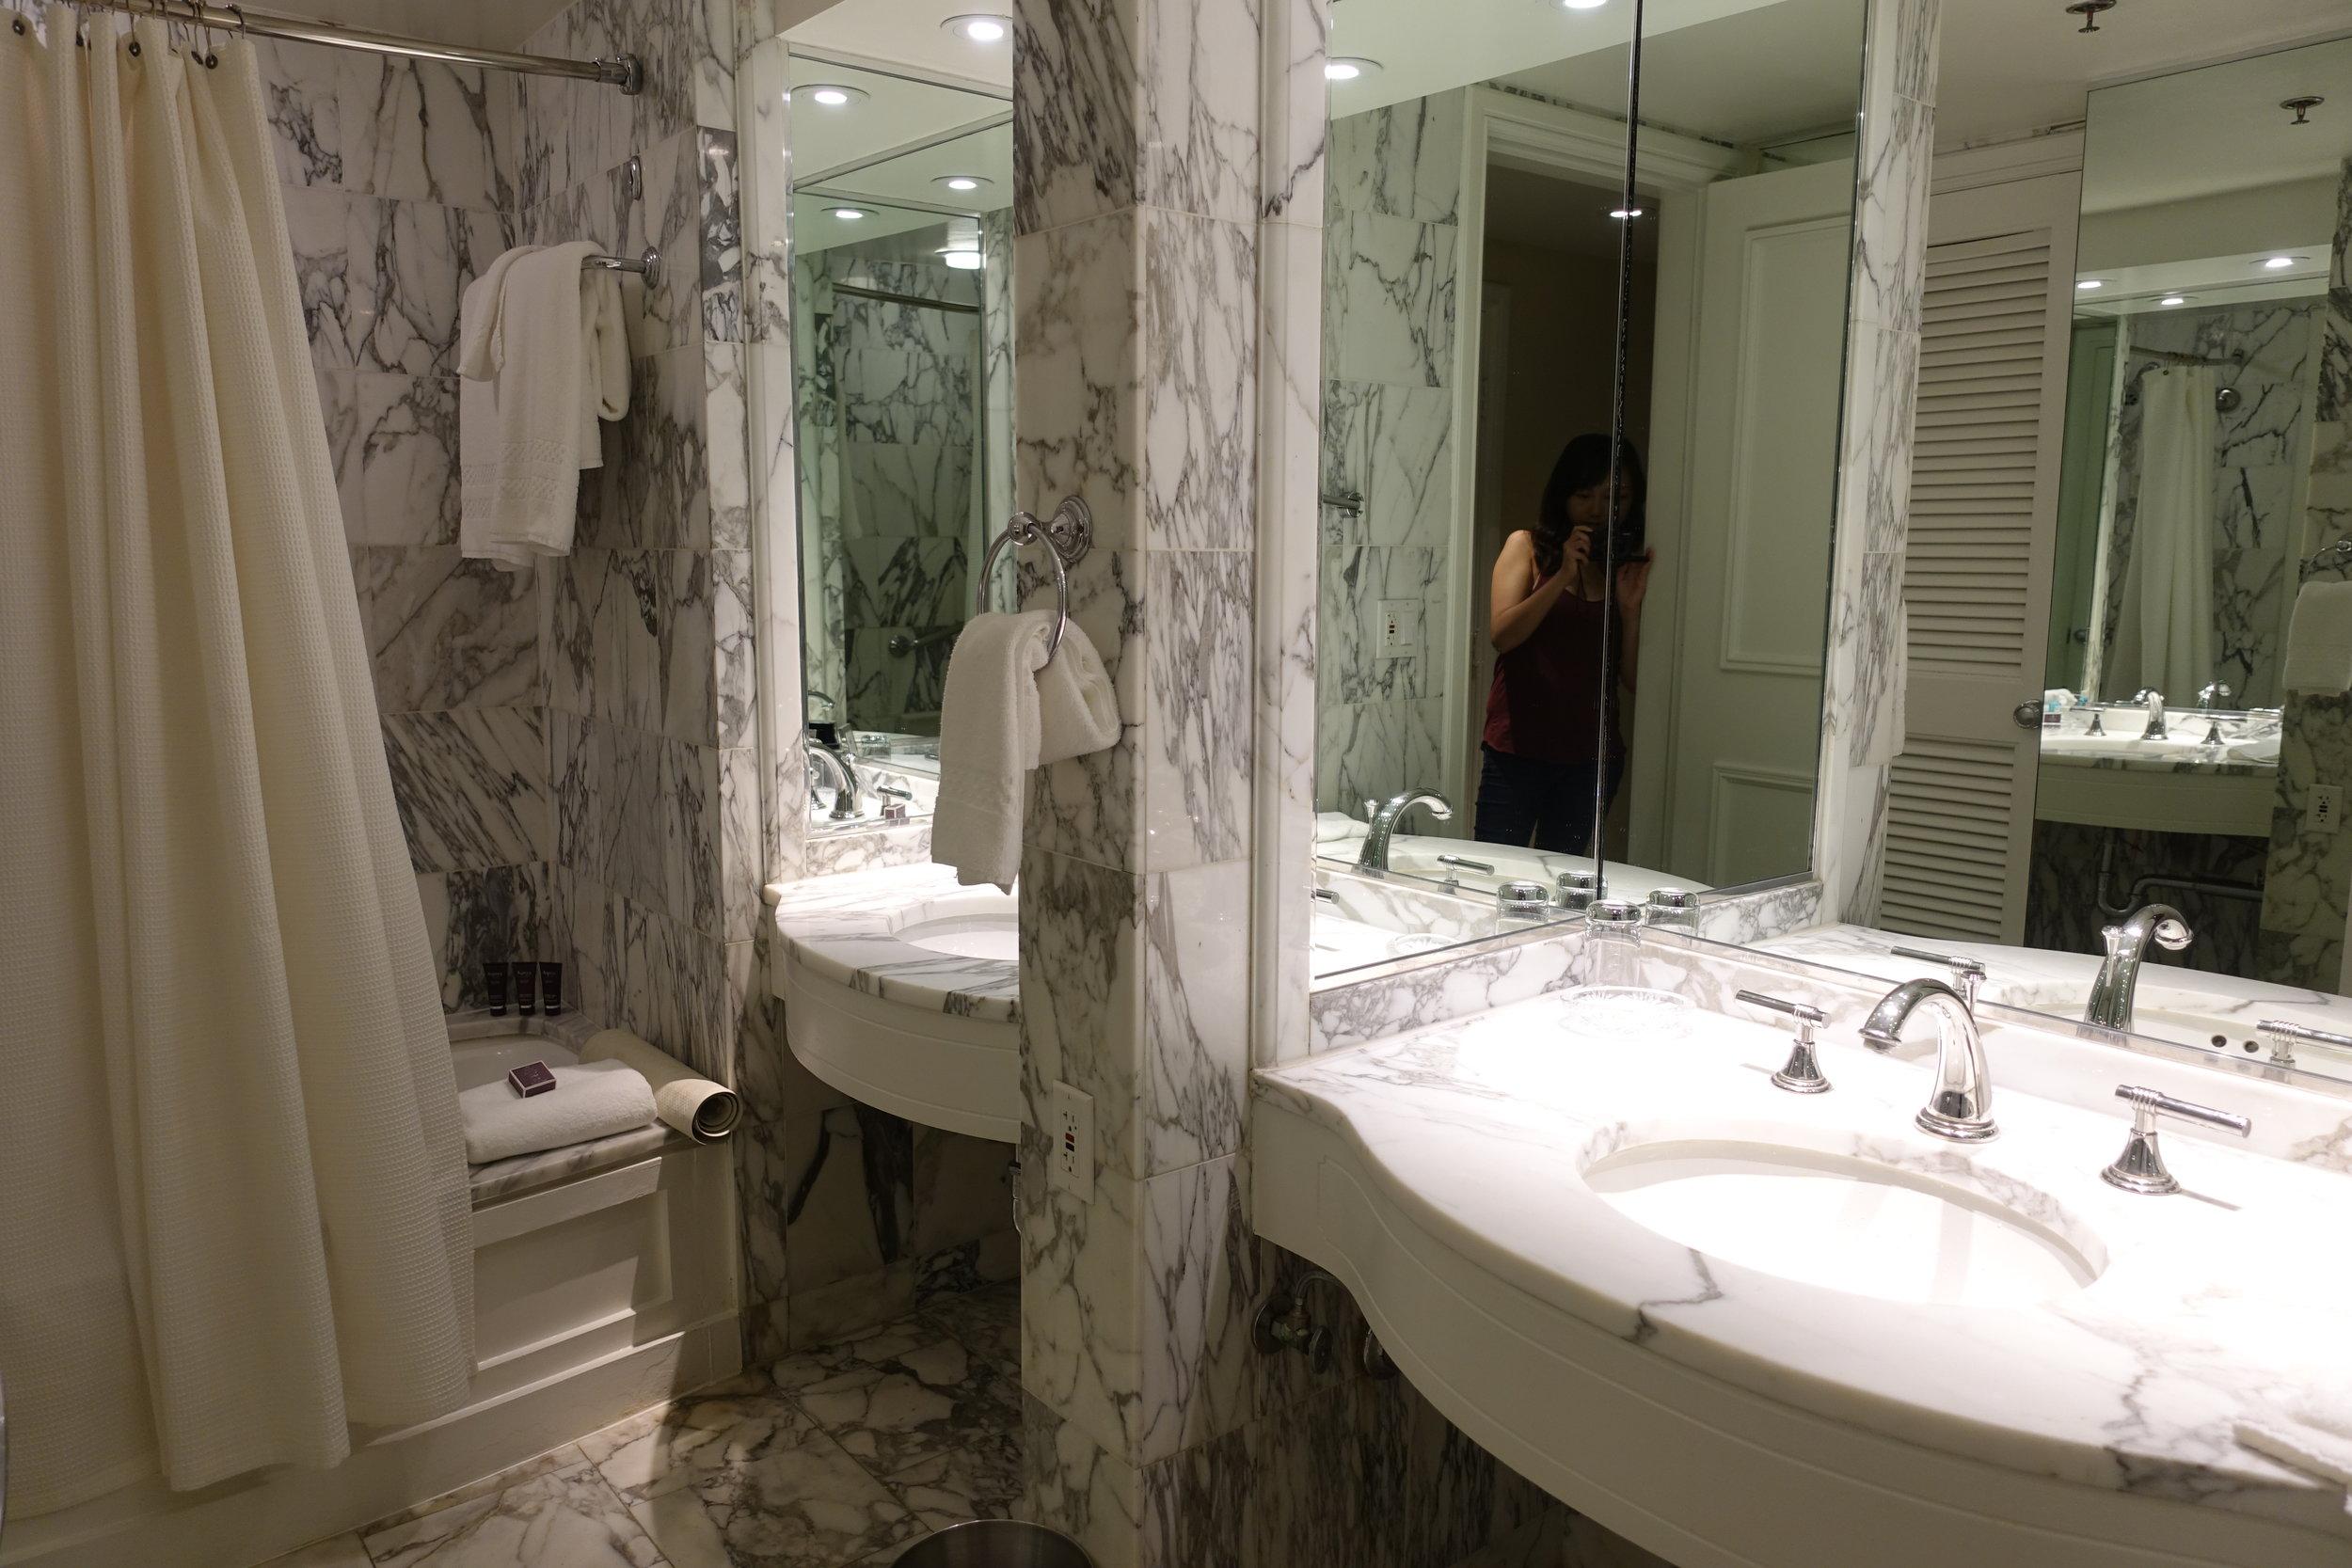 Double vanities and tub